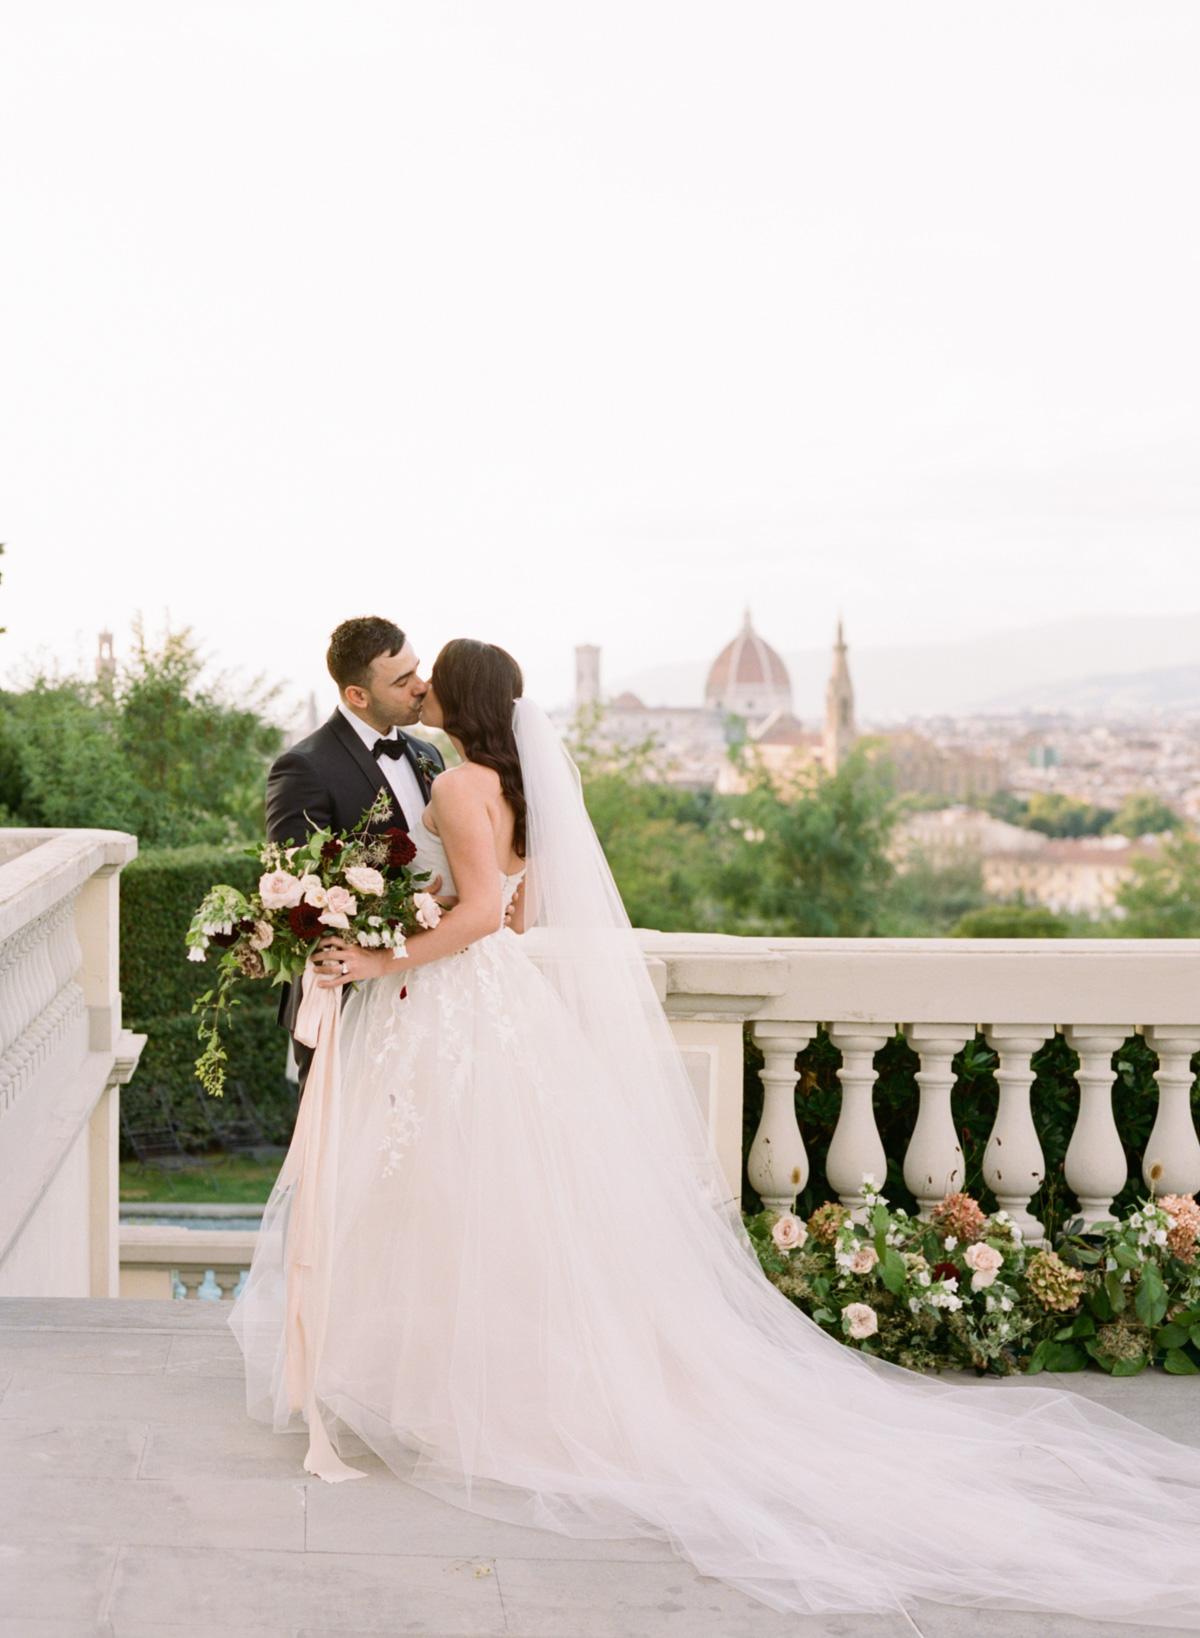 Villa la Vedetta Italy Wedding Katie Grant Photo (1 of 1).jpg